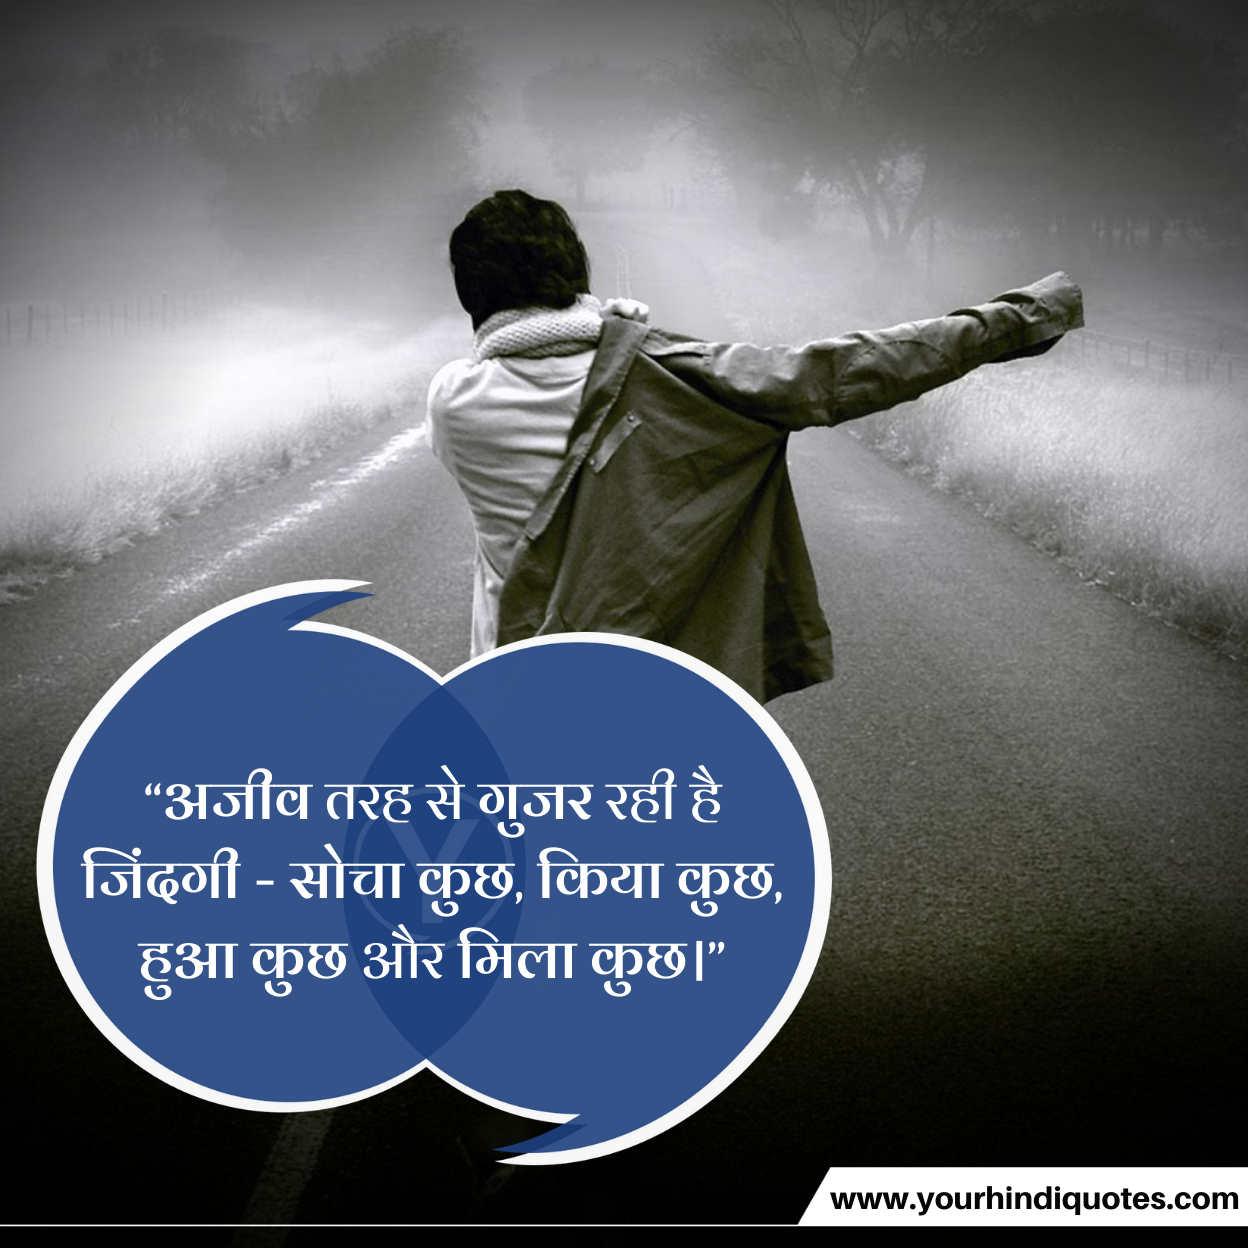 Best Hindi Life Quotes Pics